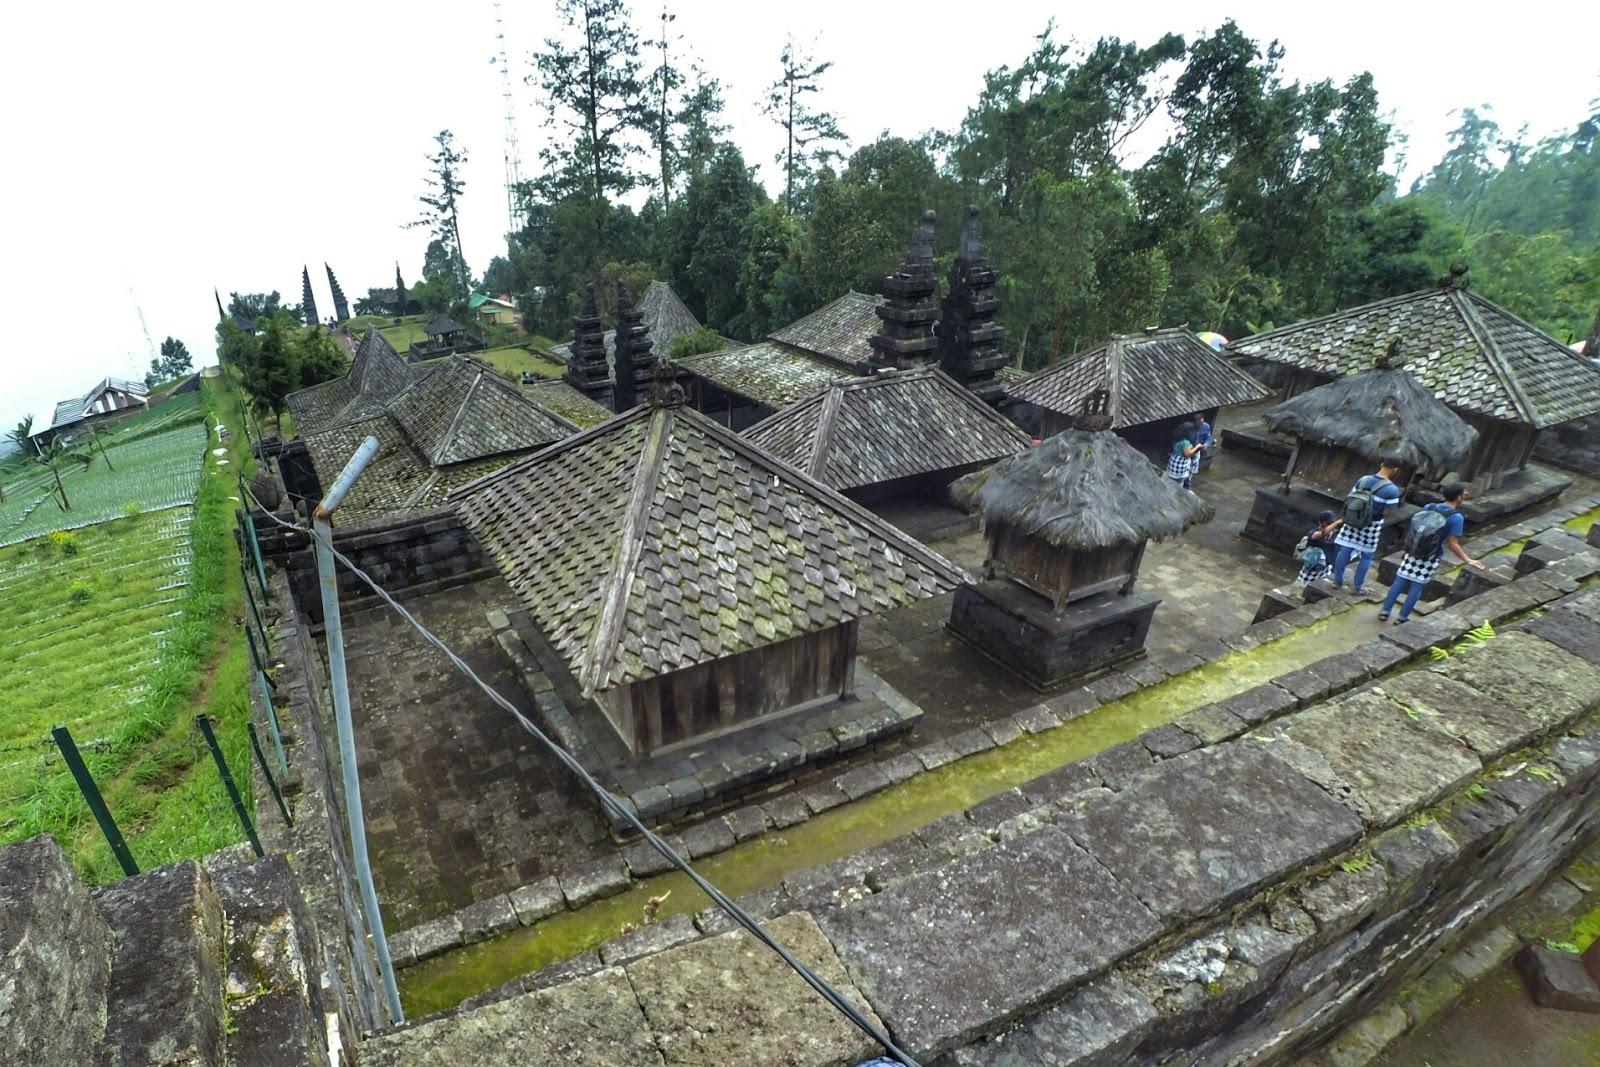 Candi Cetho Lereng Gunung Lawu Perpaduan Apik Wisata Alam Dan Sejarah Kerajaan Majapahit Zuckici Com